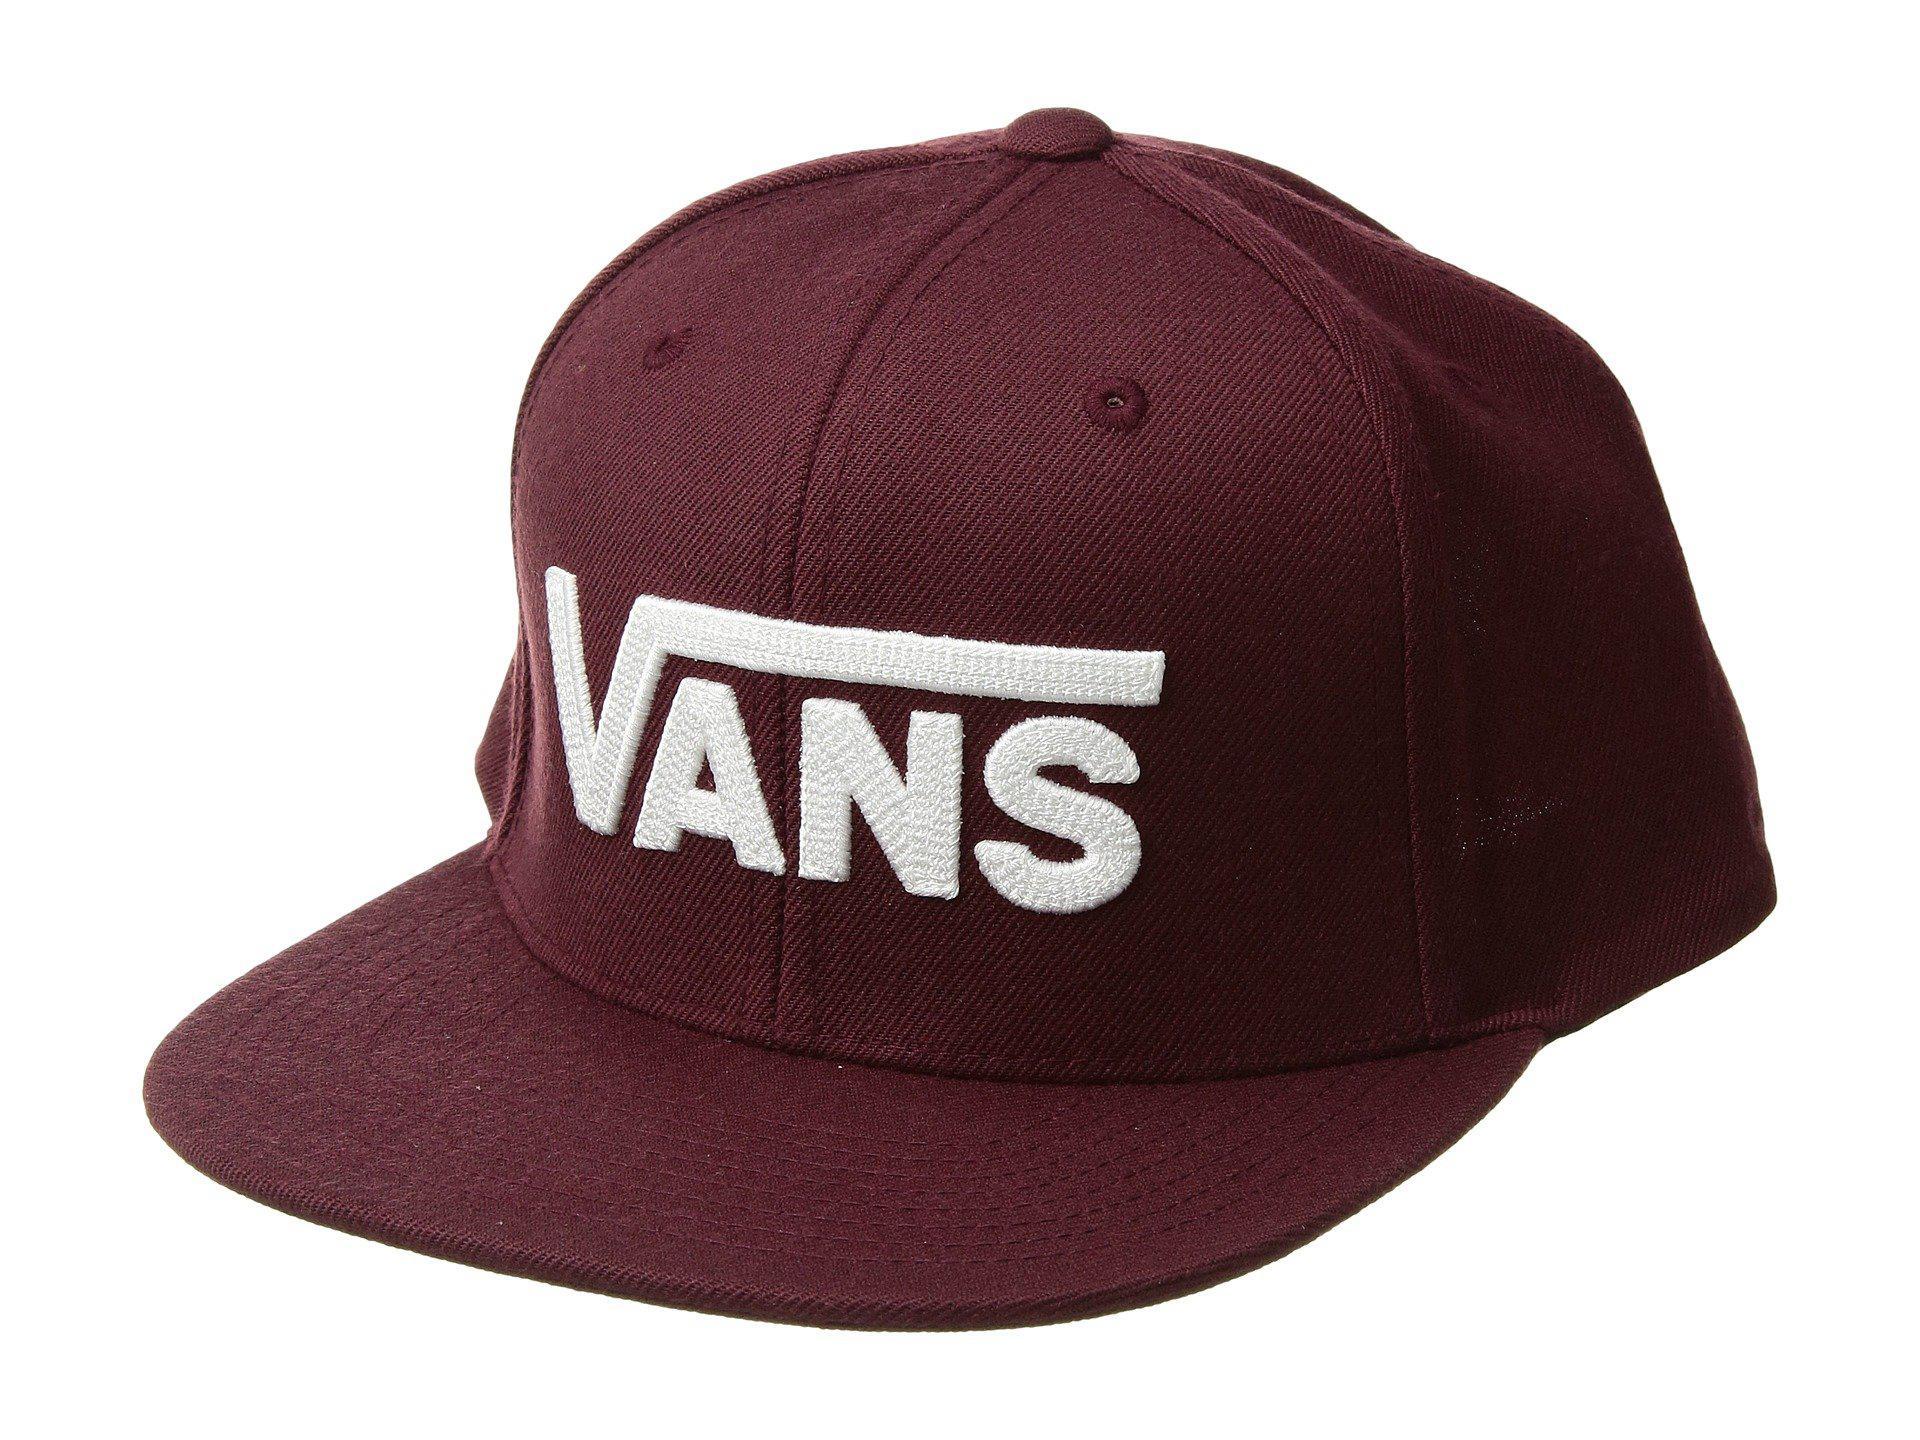 Vans - Red Drop V Ii Snapback (port Royale) Caps for Men - Lyst. View  fullscreen 0d9ae5577